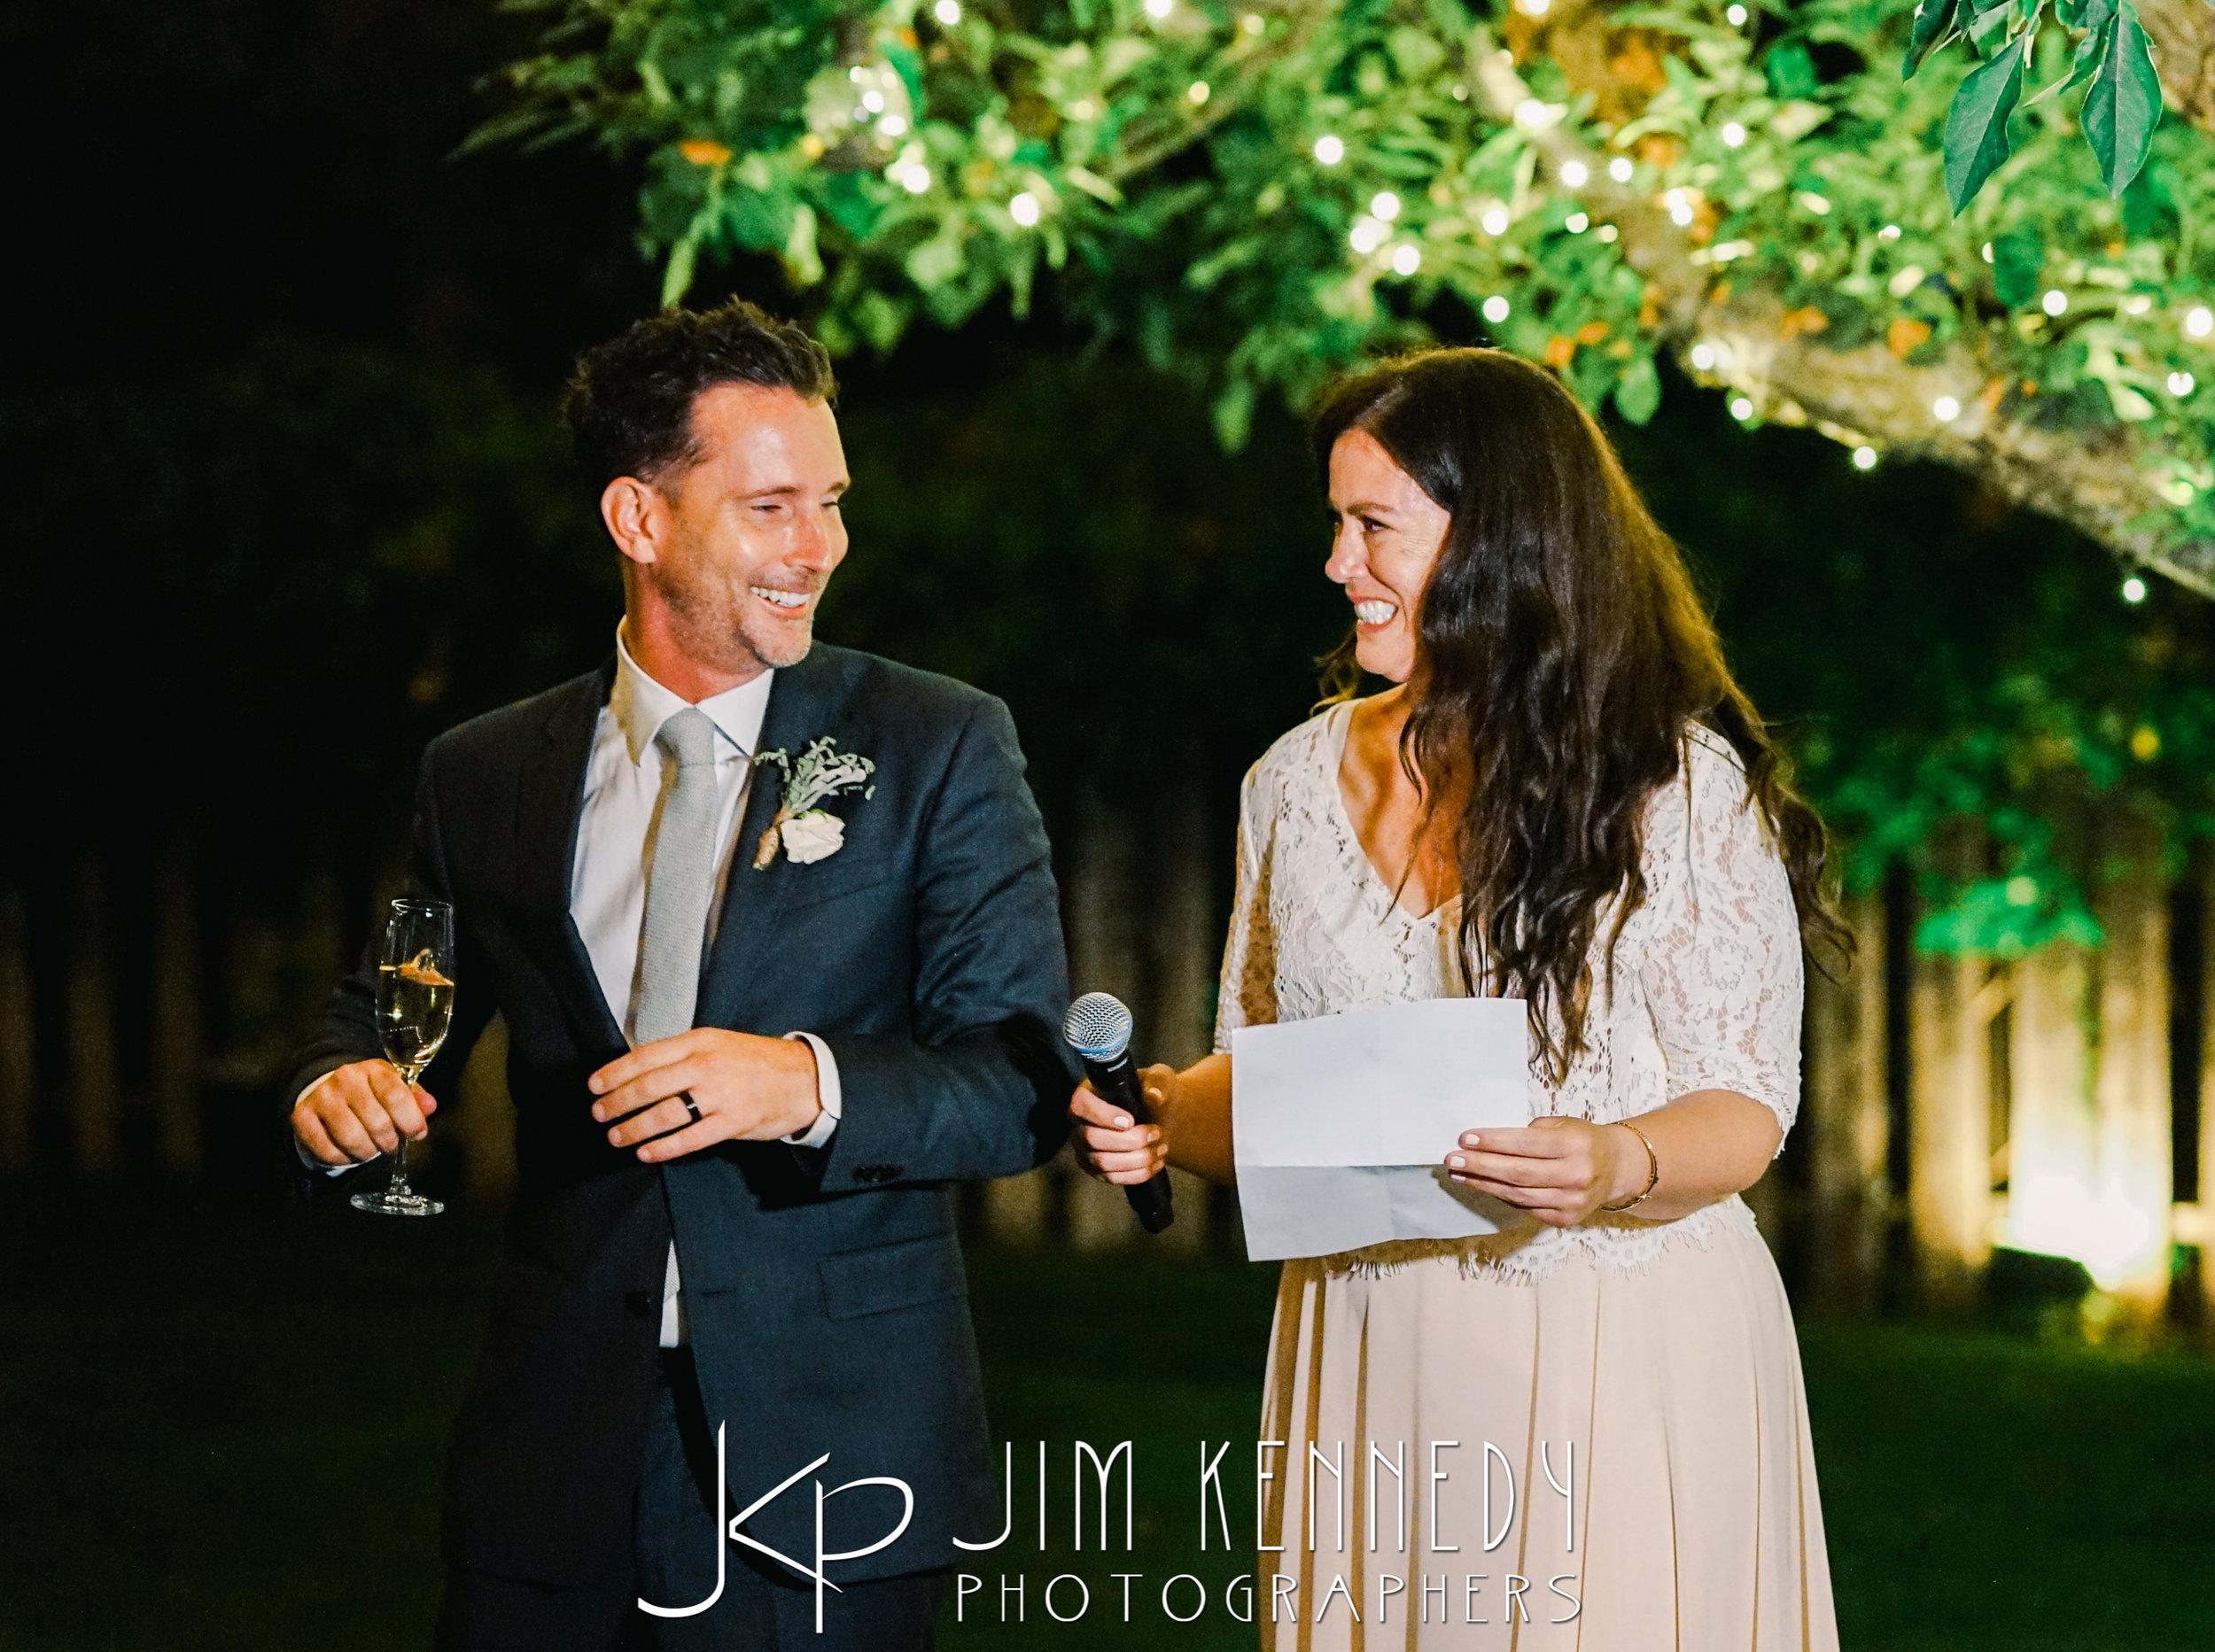 rancho_las_lomas_wedding_lauren_dylan_0217.JPG